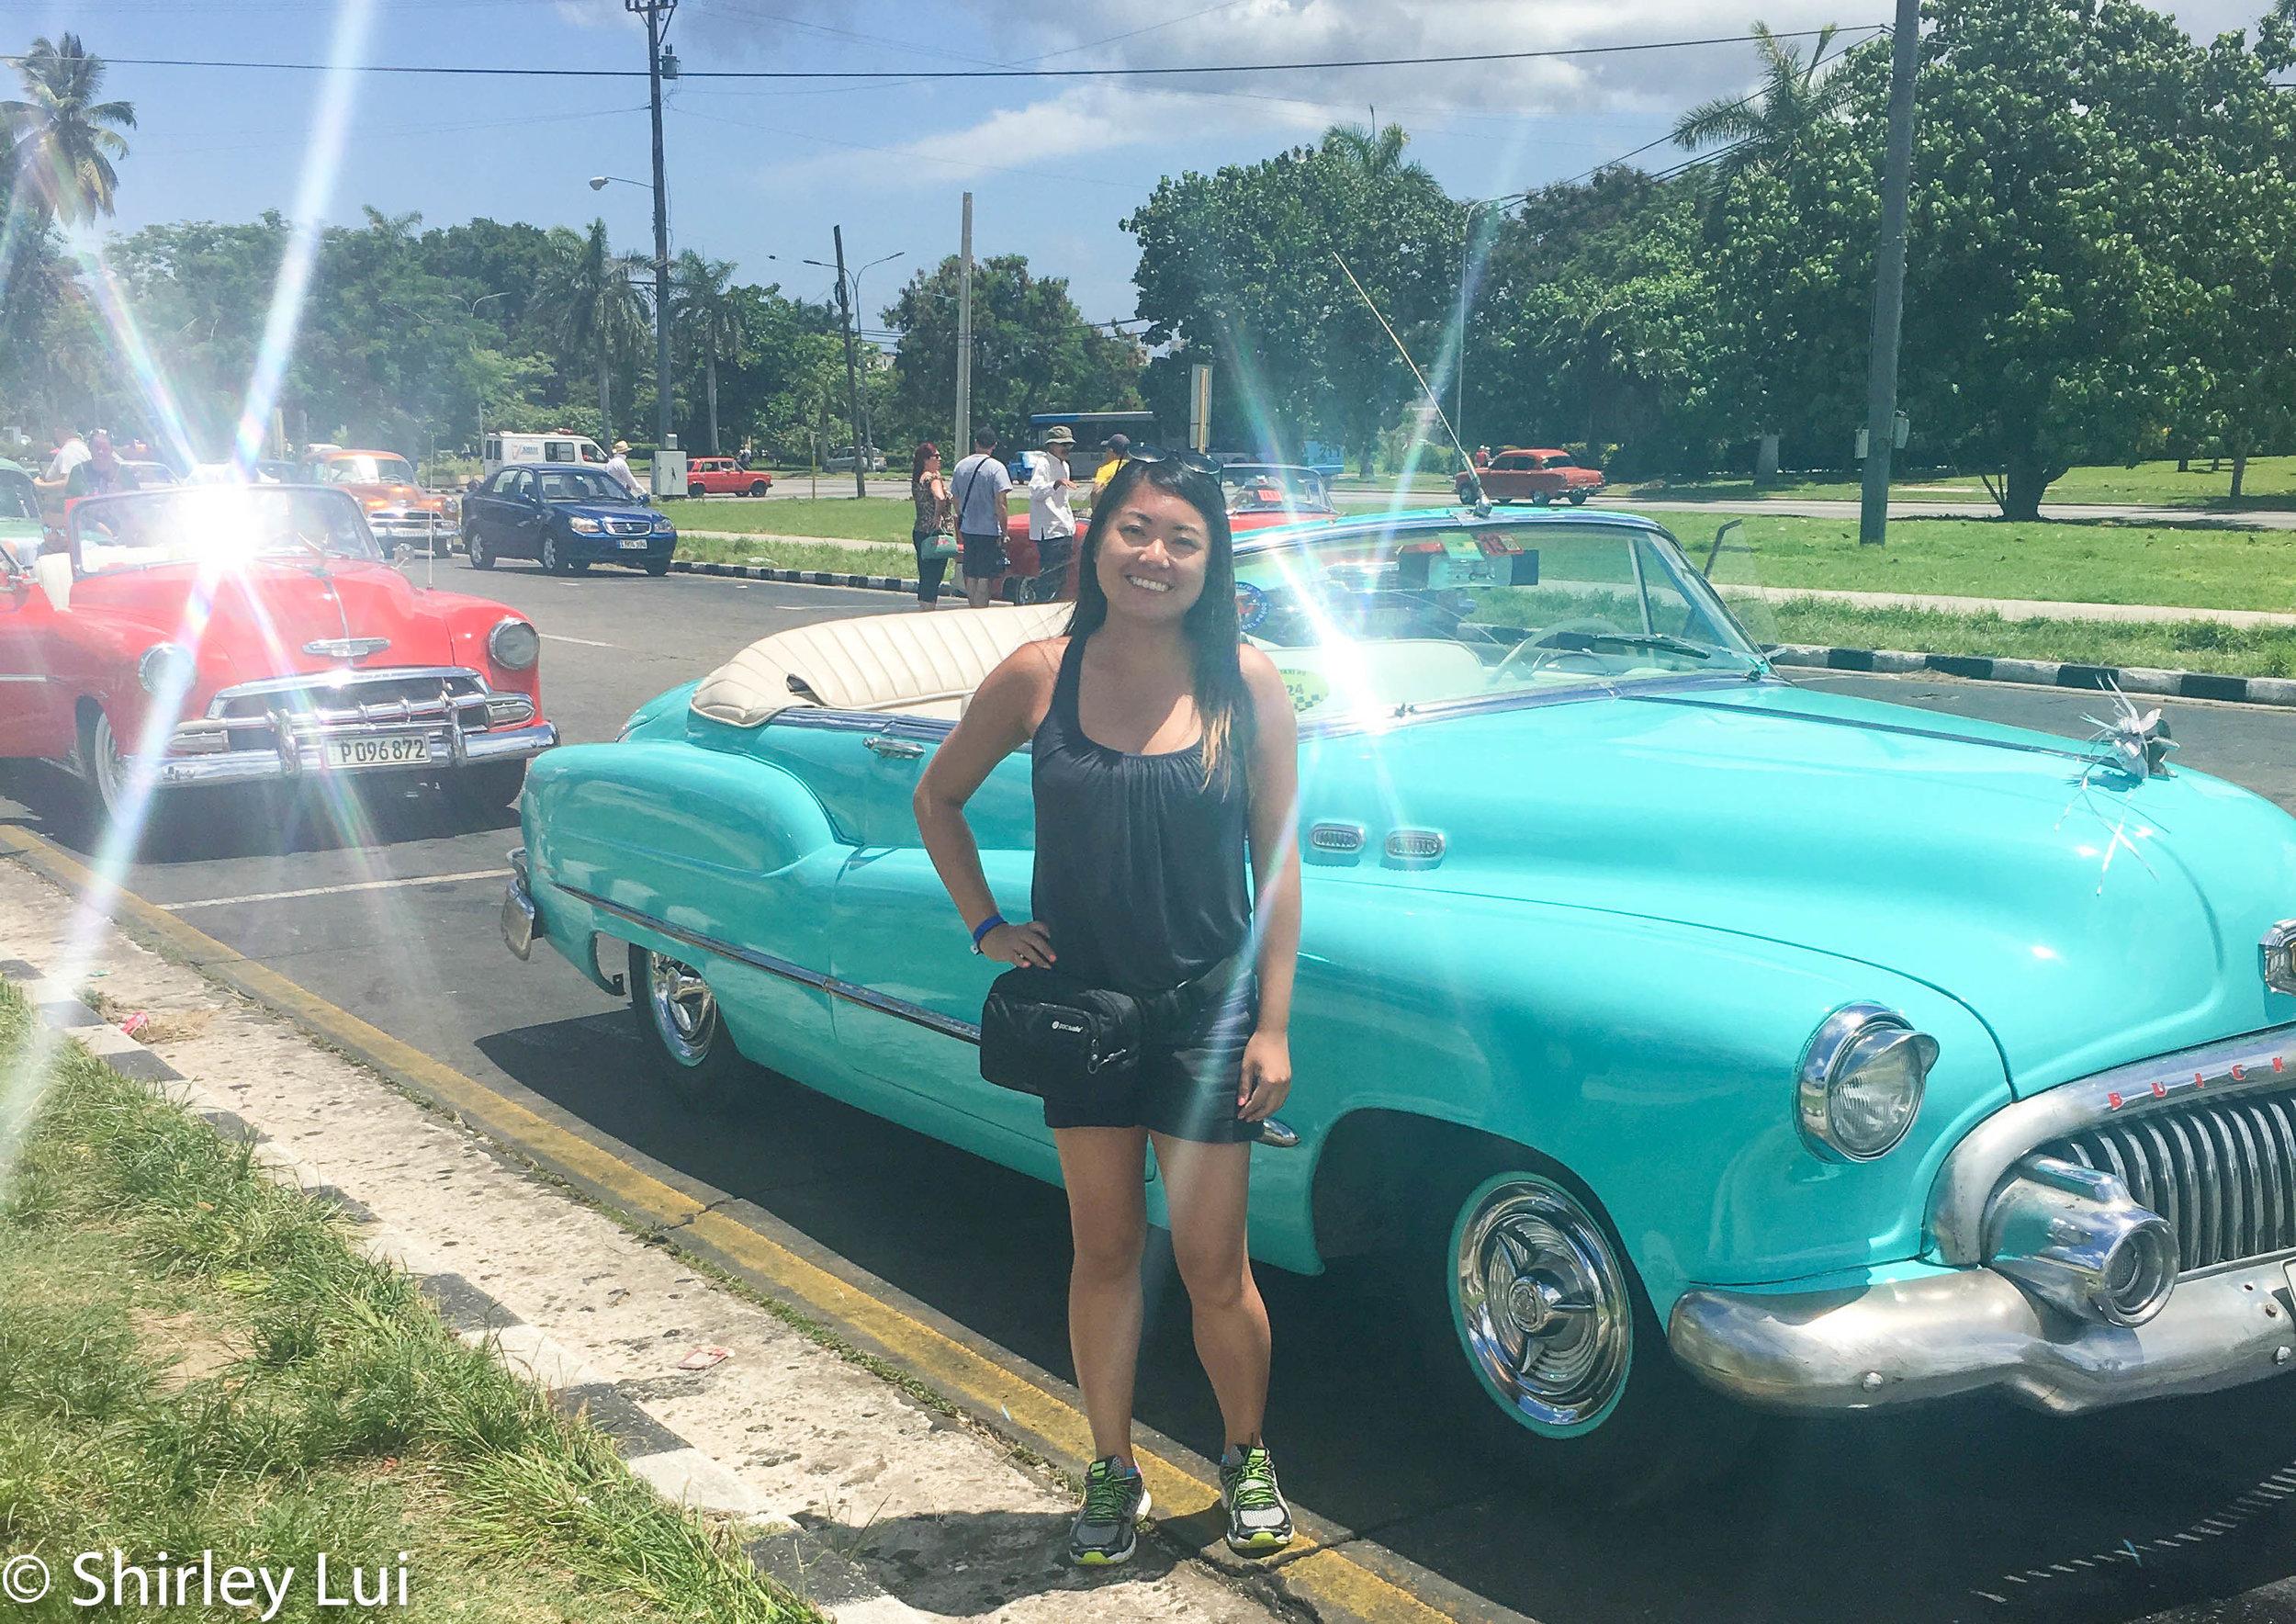 Me posing by a light blue convertible in Havana, Cuba.